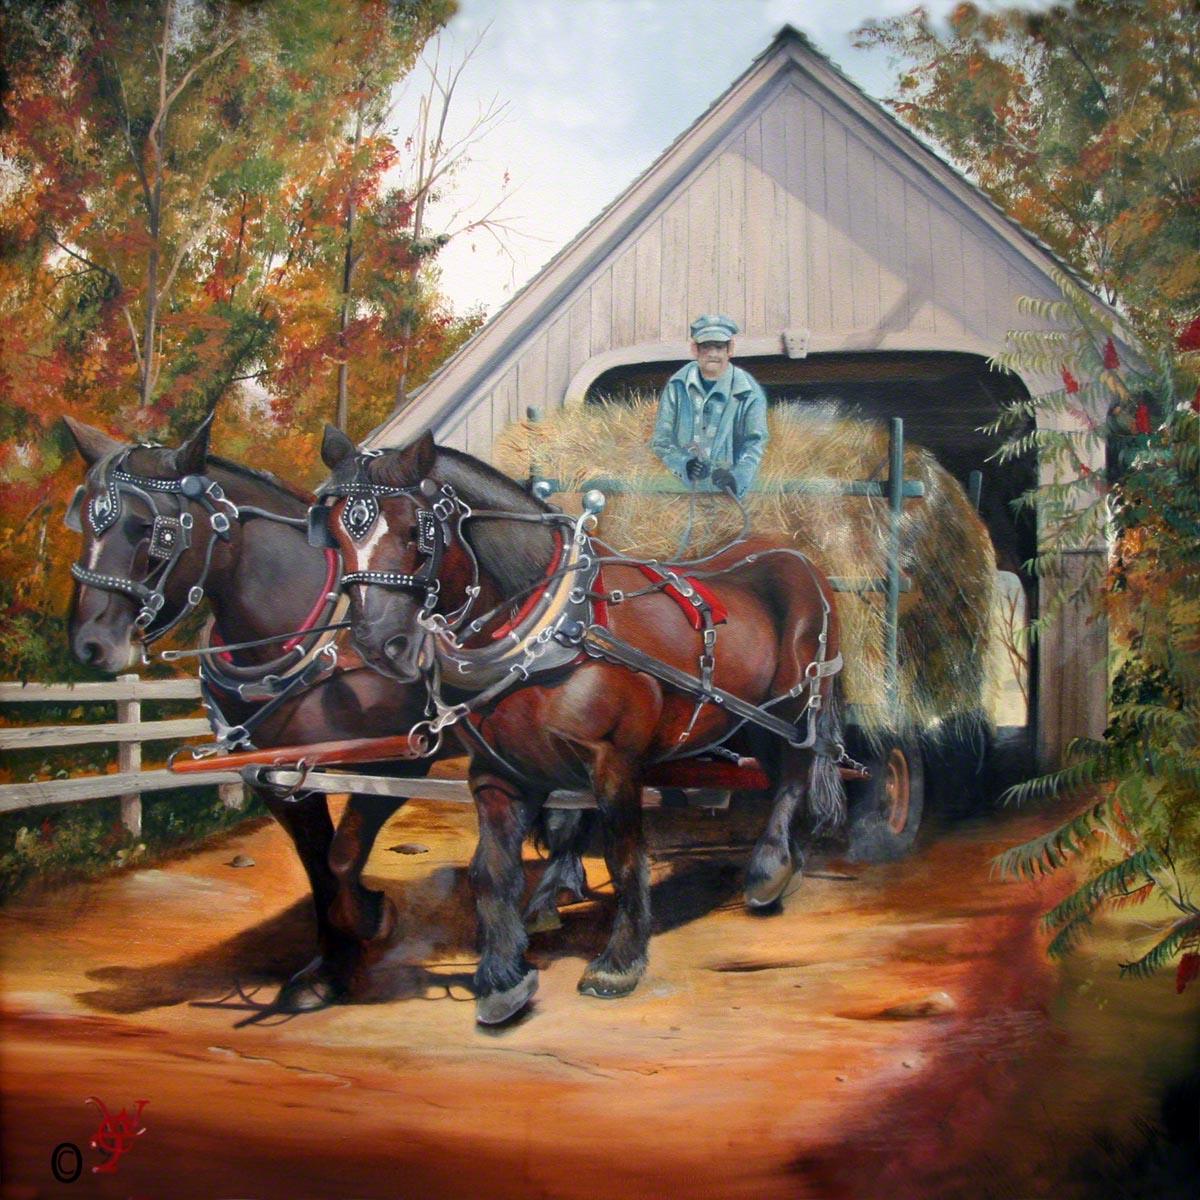 Woodstock Hayride - Oil on Canvas by William C. Turner